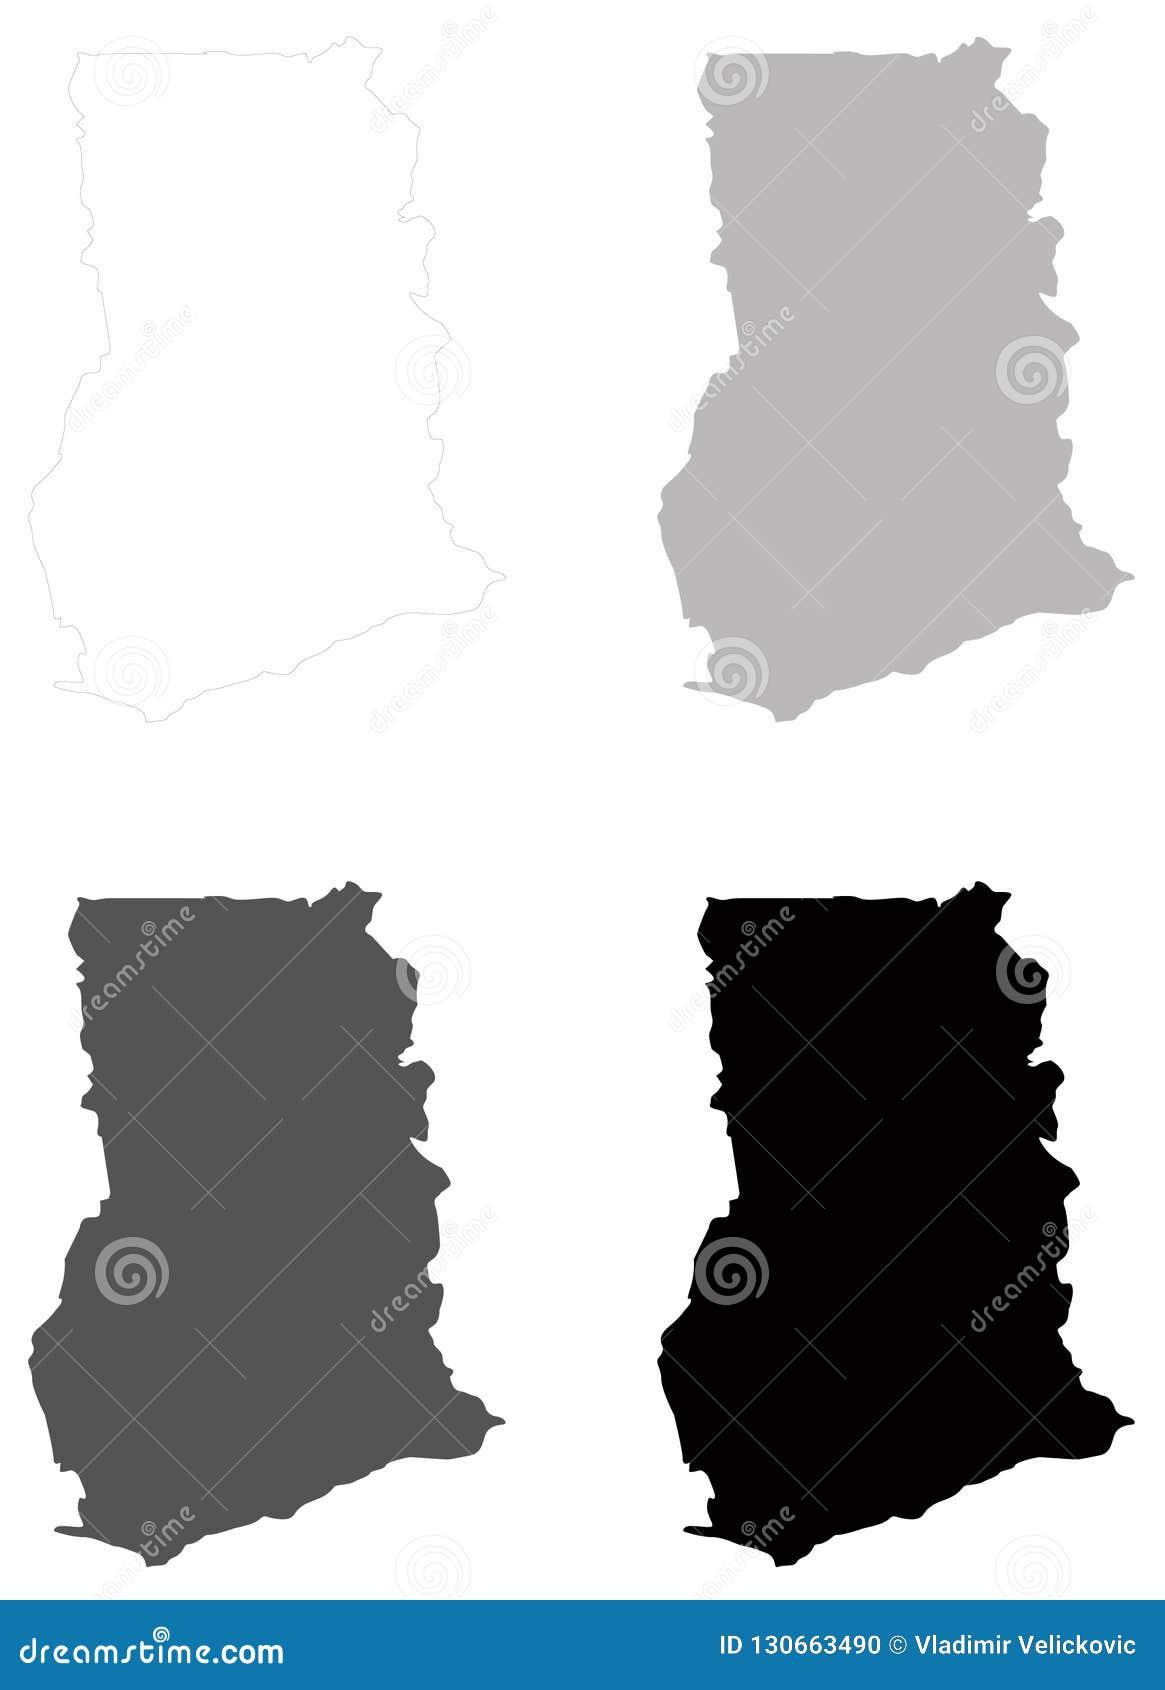 Ghana Map - Country In The West Africa Stock Vector ... on china map, ghana map detailed, united states map, ghana capital, tamale ghana map, ghana map with regions, burkina faso, ghana clothing, ghana cities, ghana rivers map, israel map, ghana water, sierra leone, ghana flag, ghana king, mauritius map, ghana desserts, south africa, ghana schools, indonesia map, costa rica map, west africa, world map, mali map,